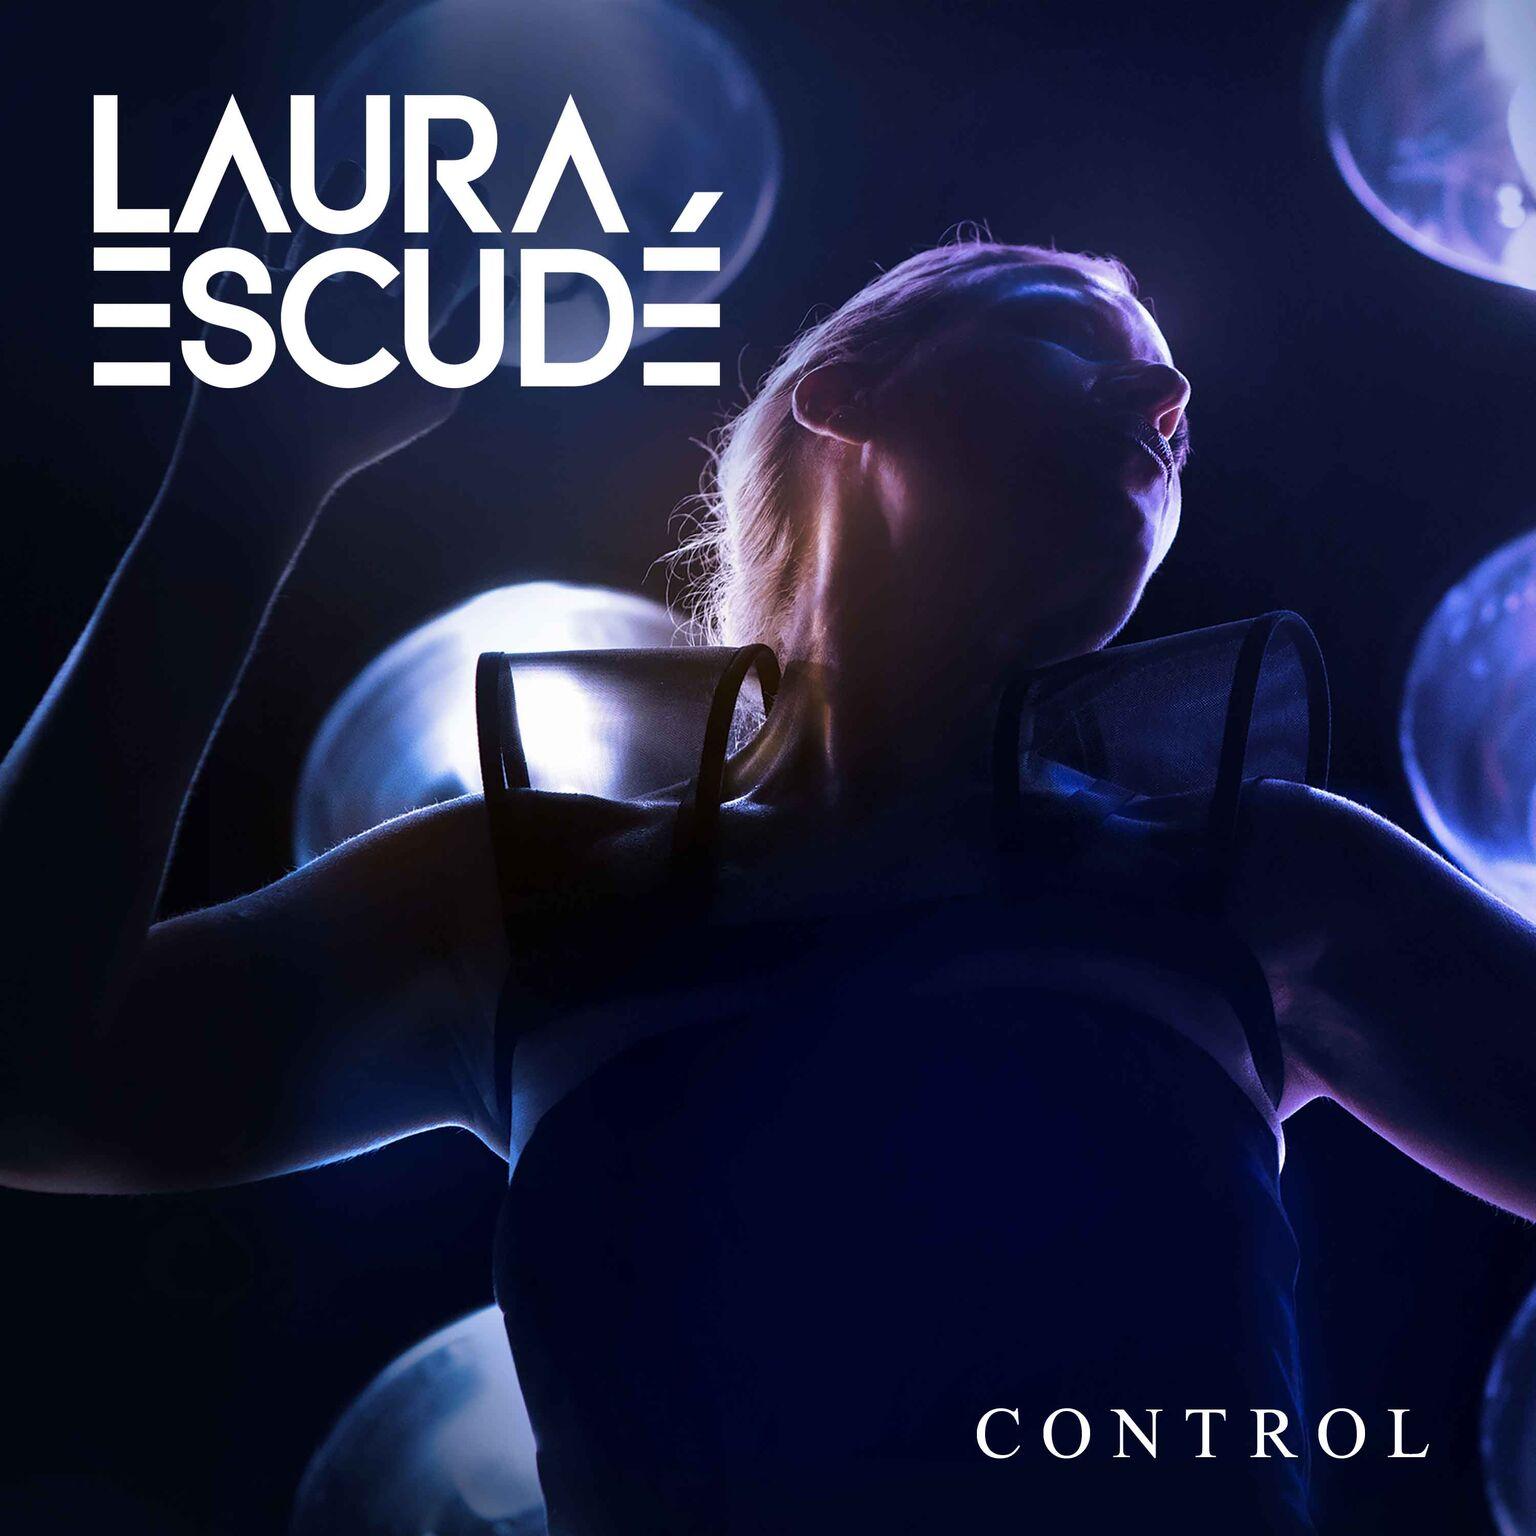 laura-escude-control.jpg